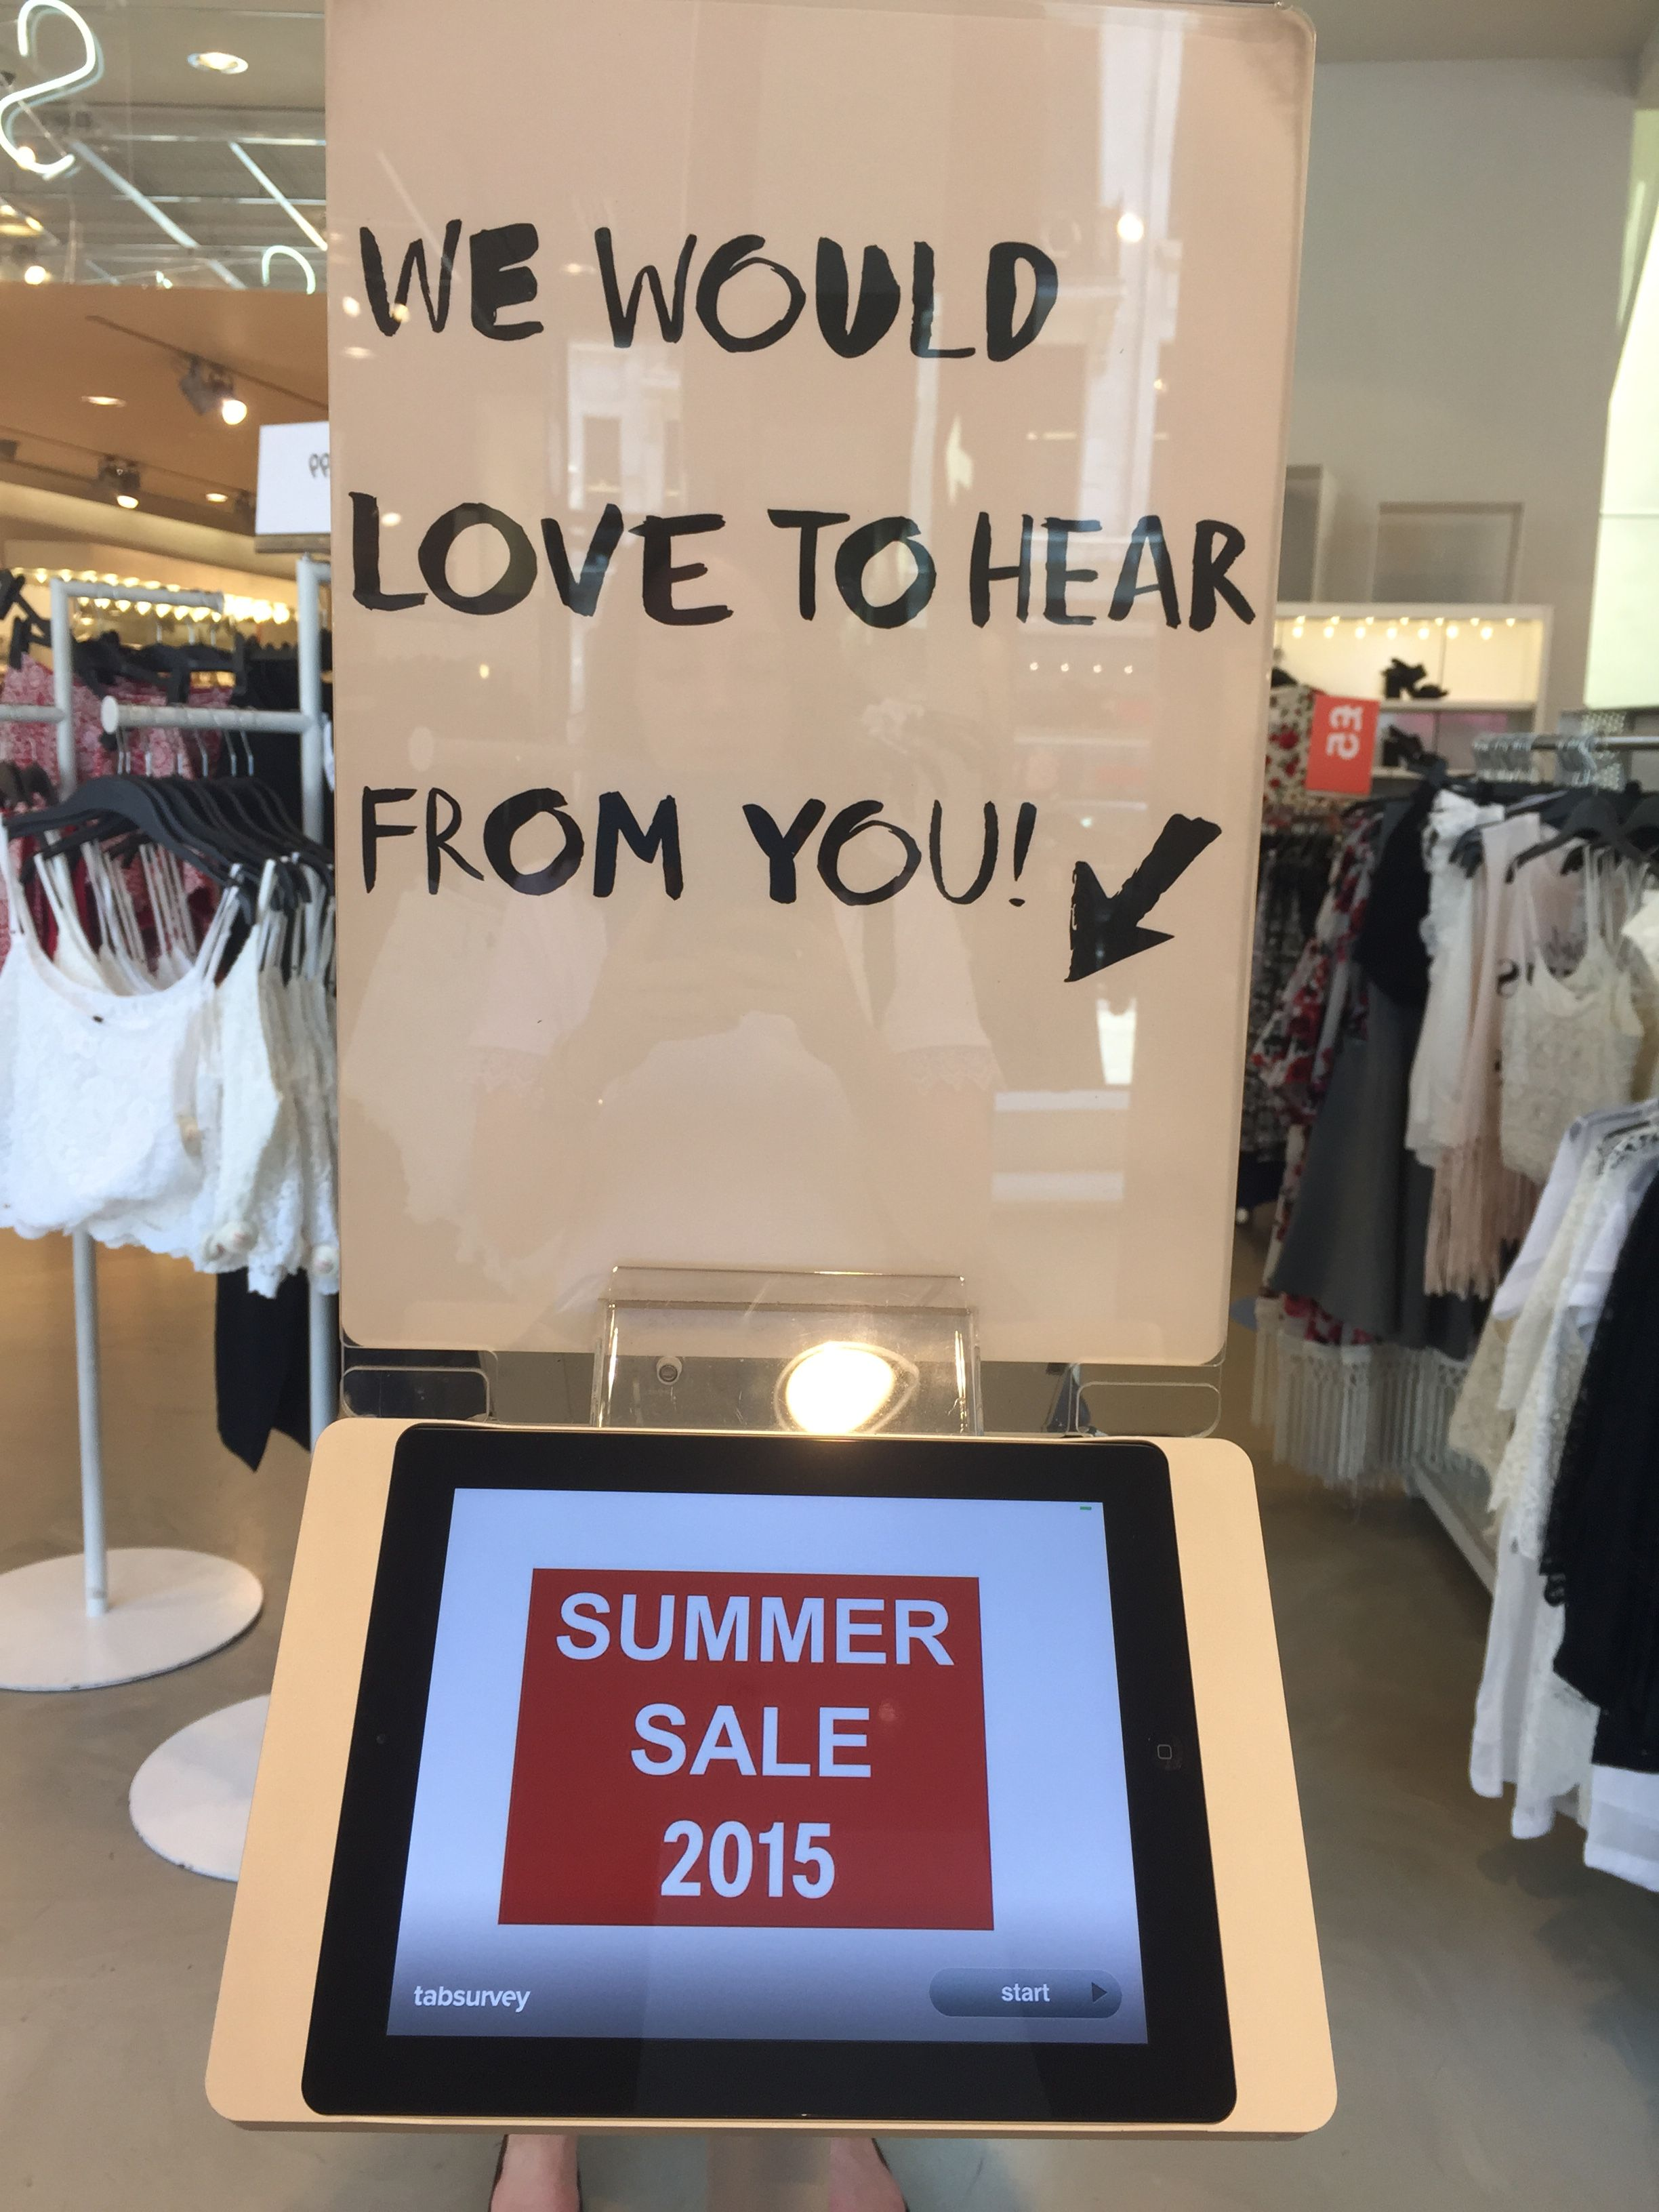 Reviews of Fashionsale. Fashionsale: customer opinion